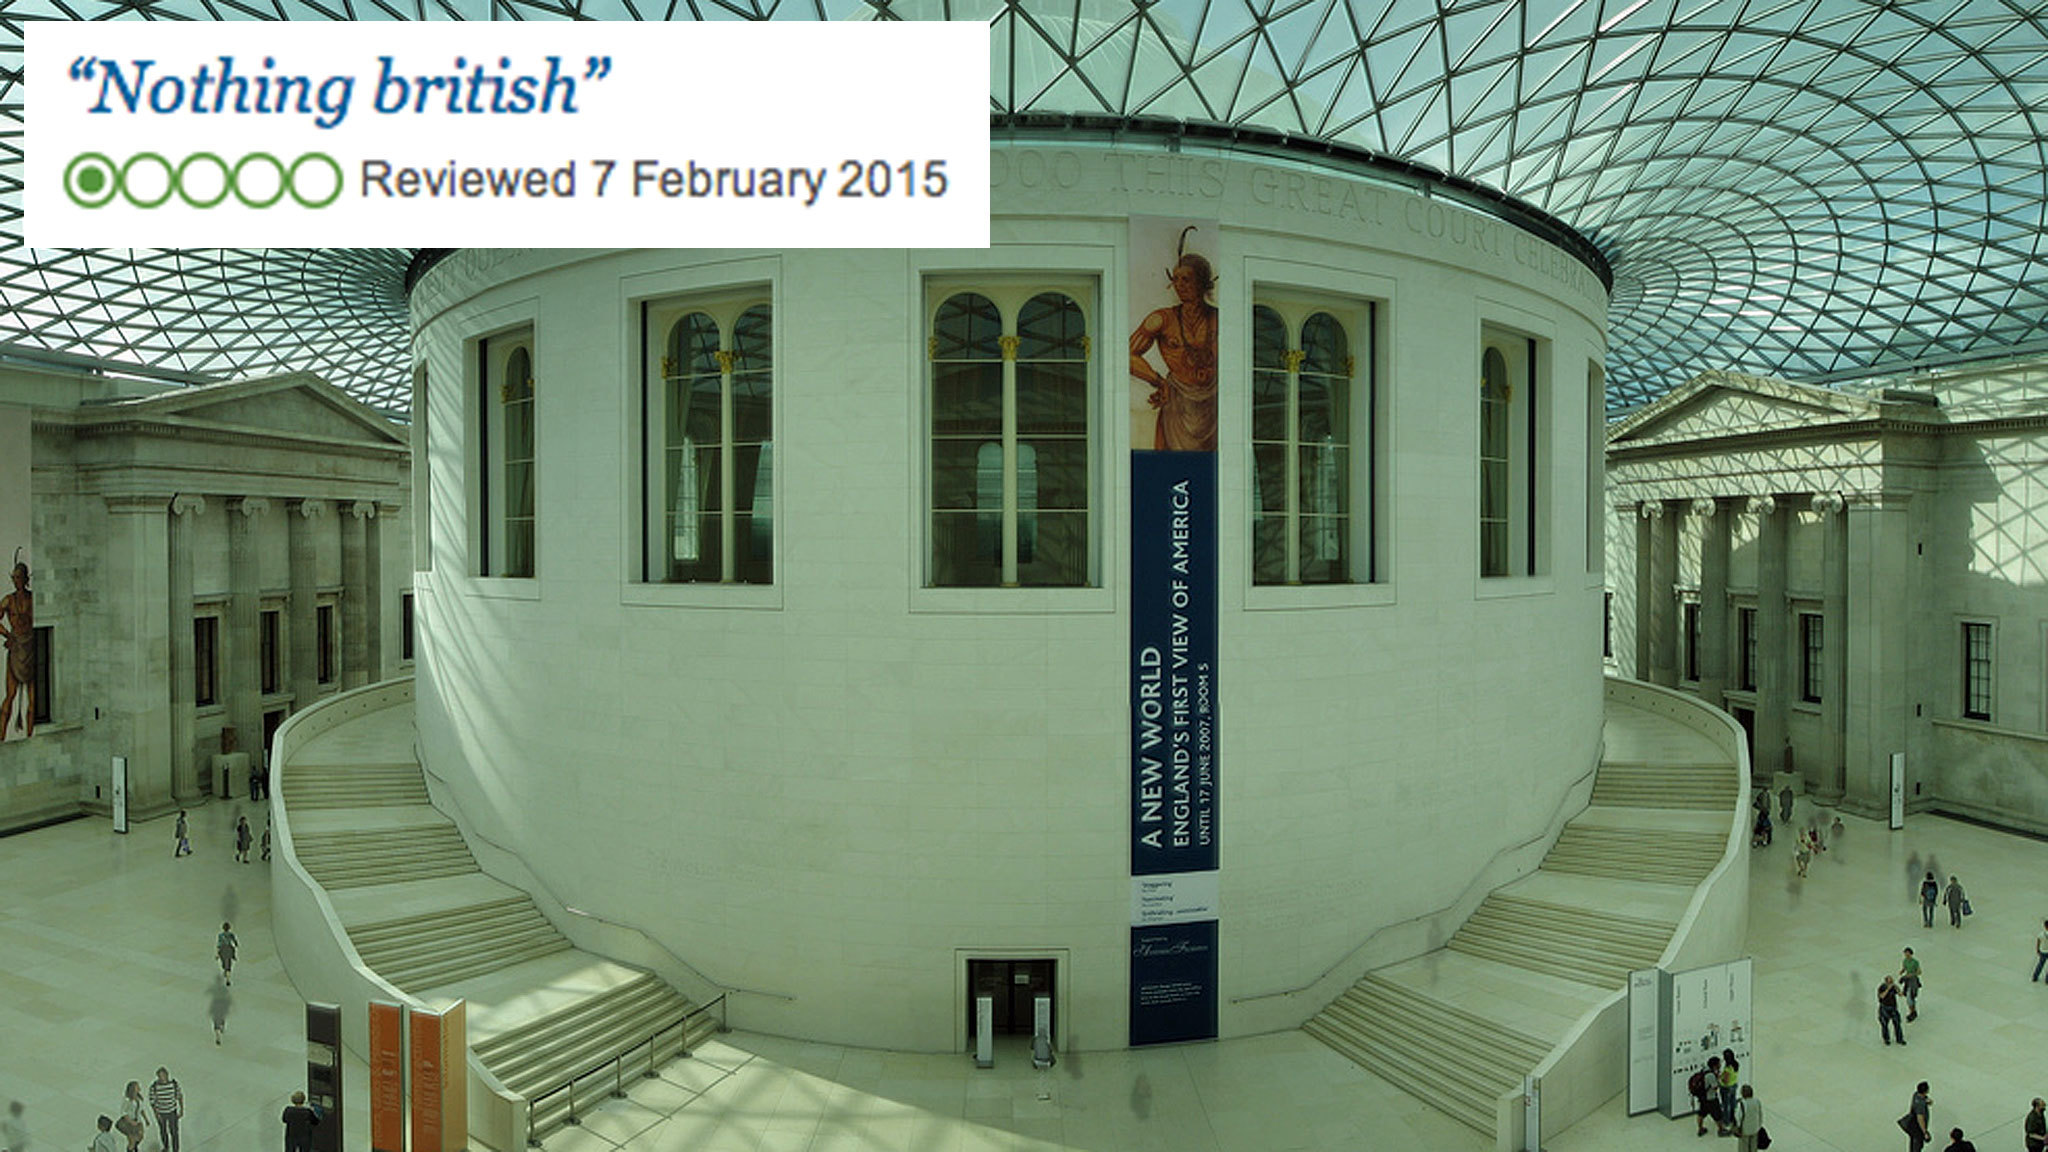 British Museum TripAdvisor Review